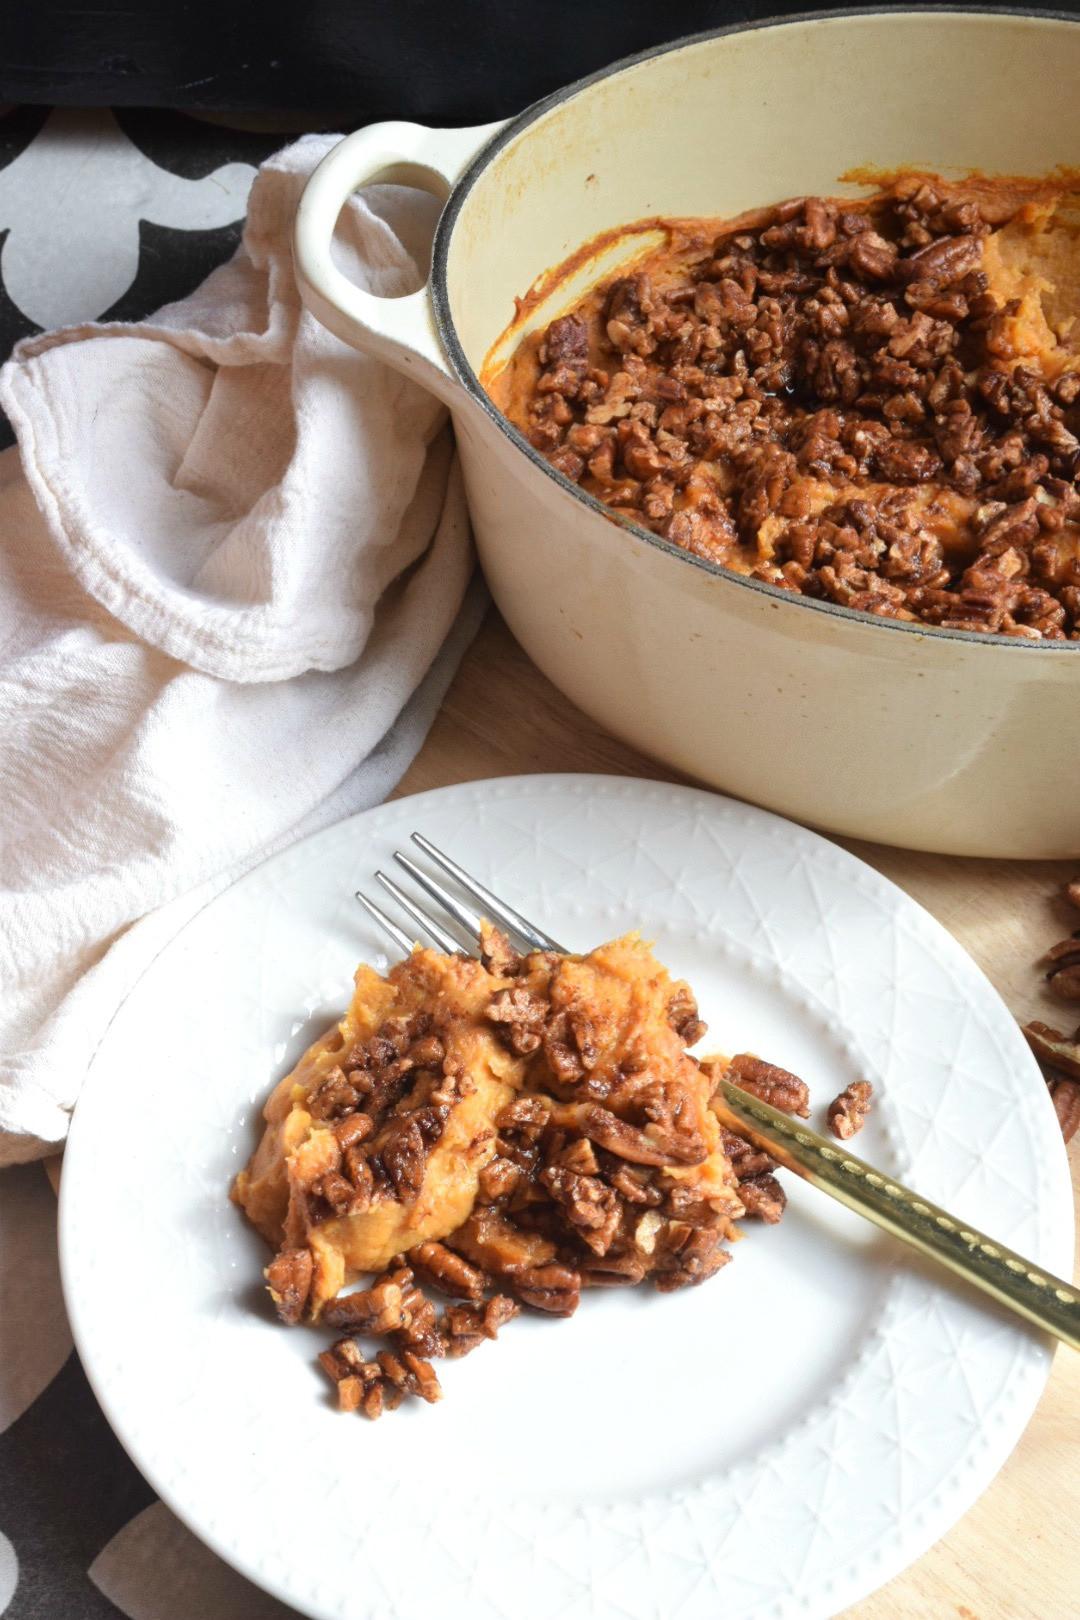 Paleo Thanksgiving Sweet Potatoes  Paleo Sweet Potato Casserole Healthy Thanksgiving Side